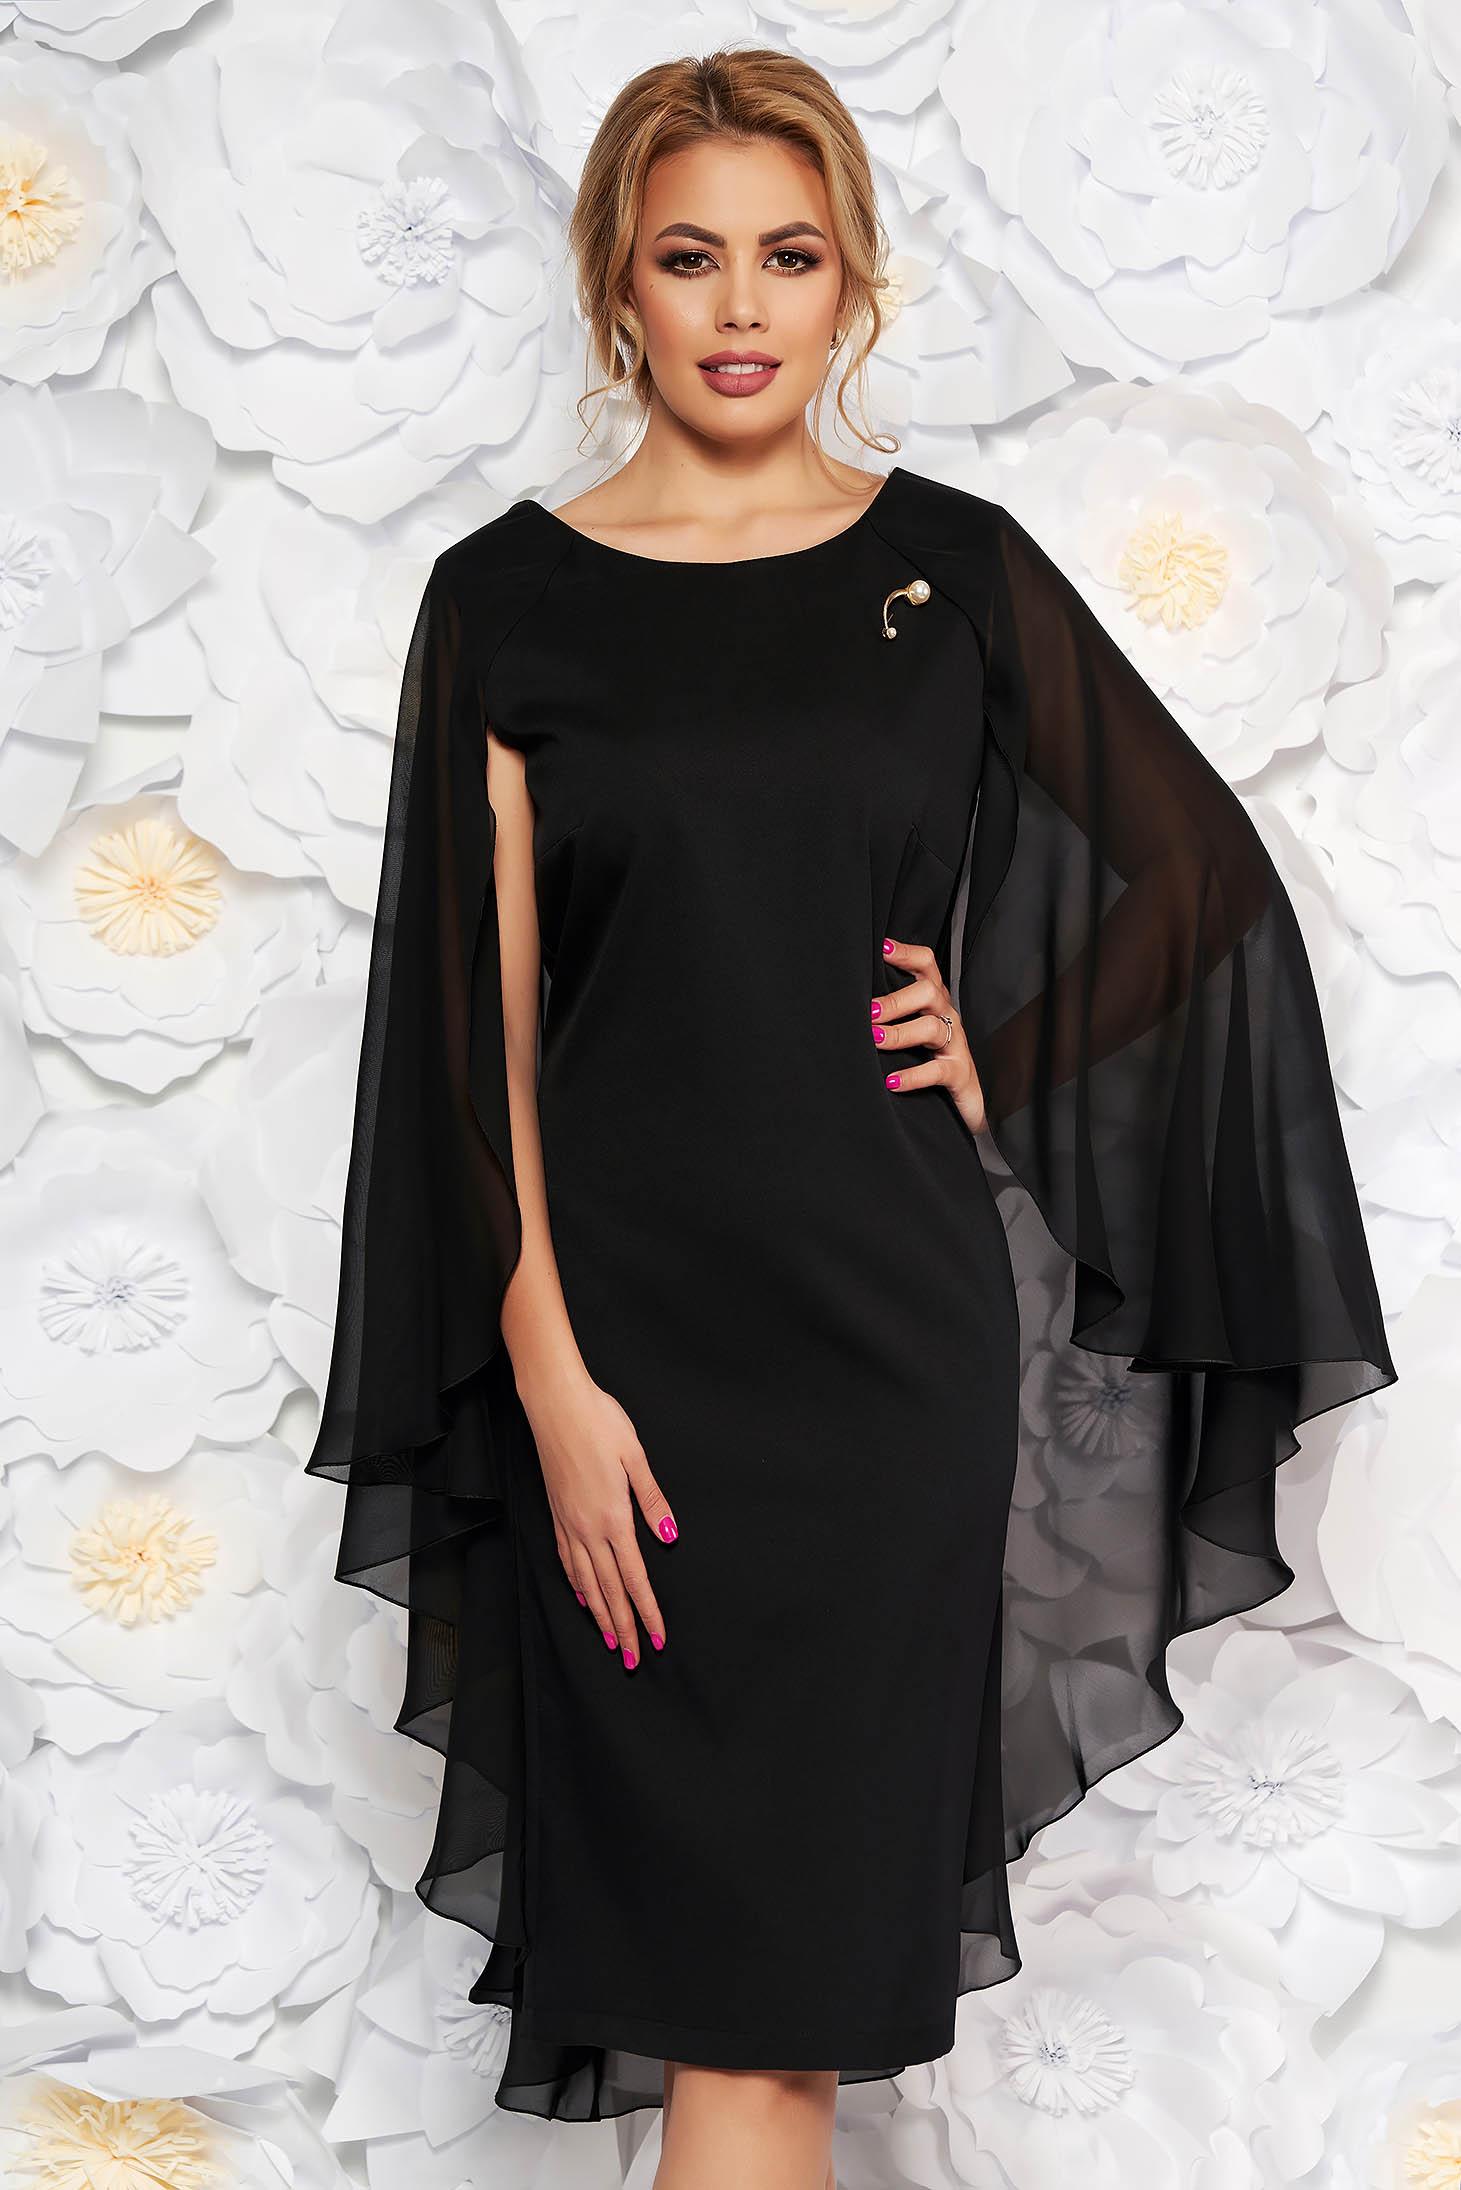 Rochie neagra de ocazie din stofa subtire usor elastica suprapunere cu voal